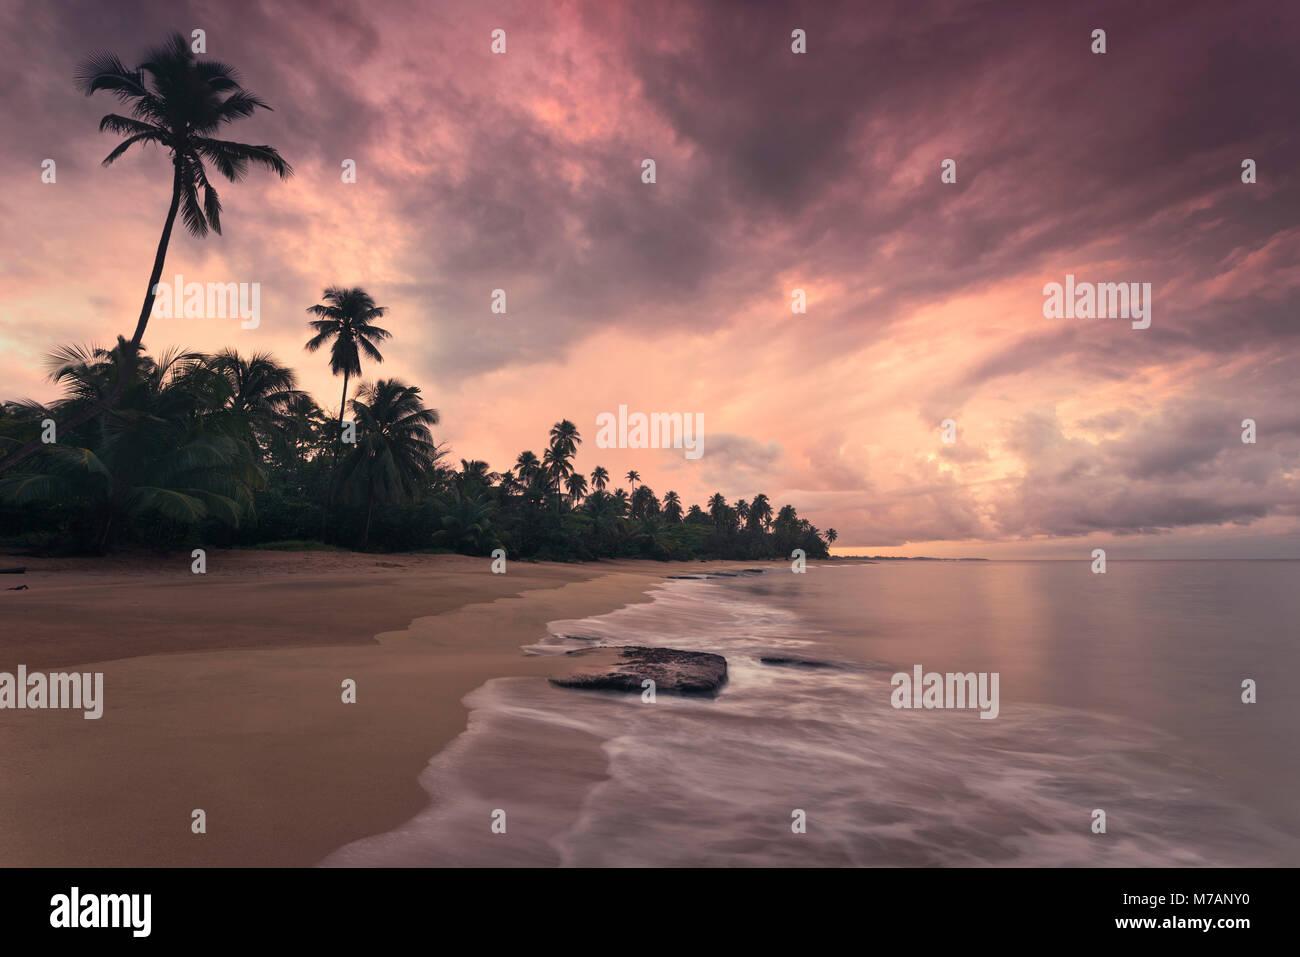 Caribbean dream beach in sunset, Punta Vacia, Puerto Rico, Caribbean island, - Stock Image